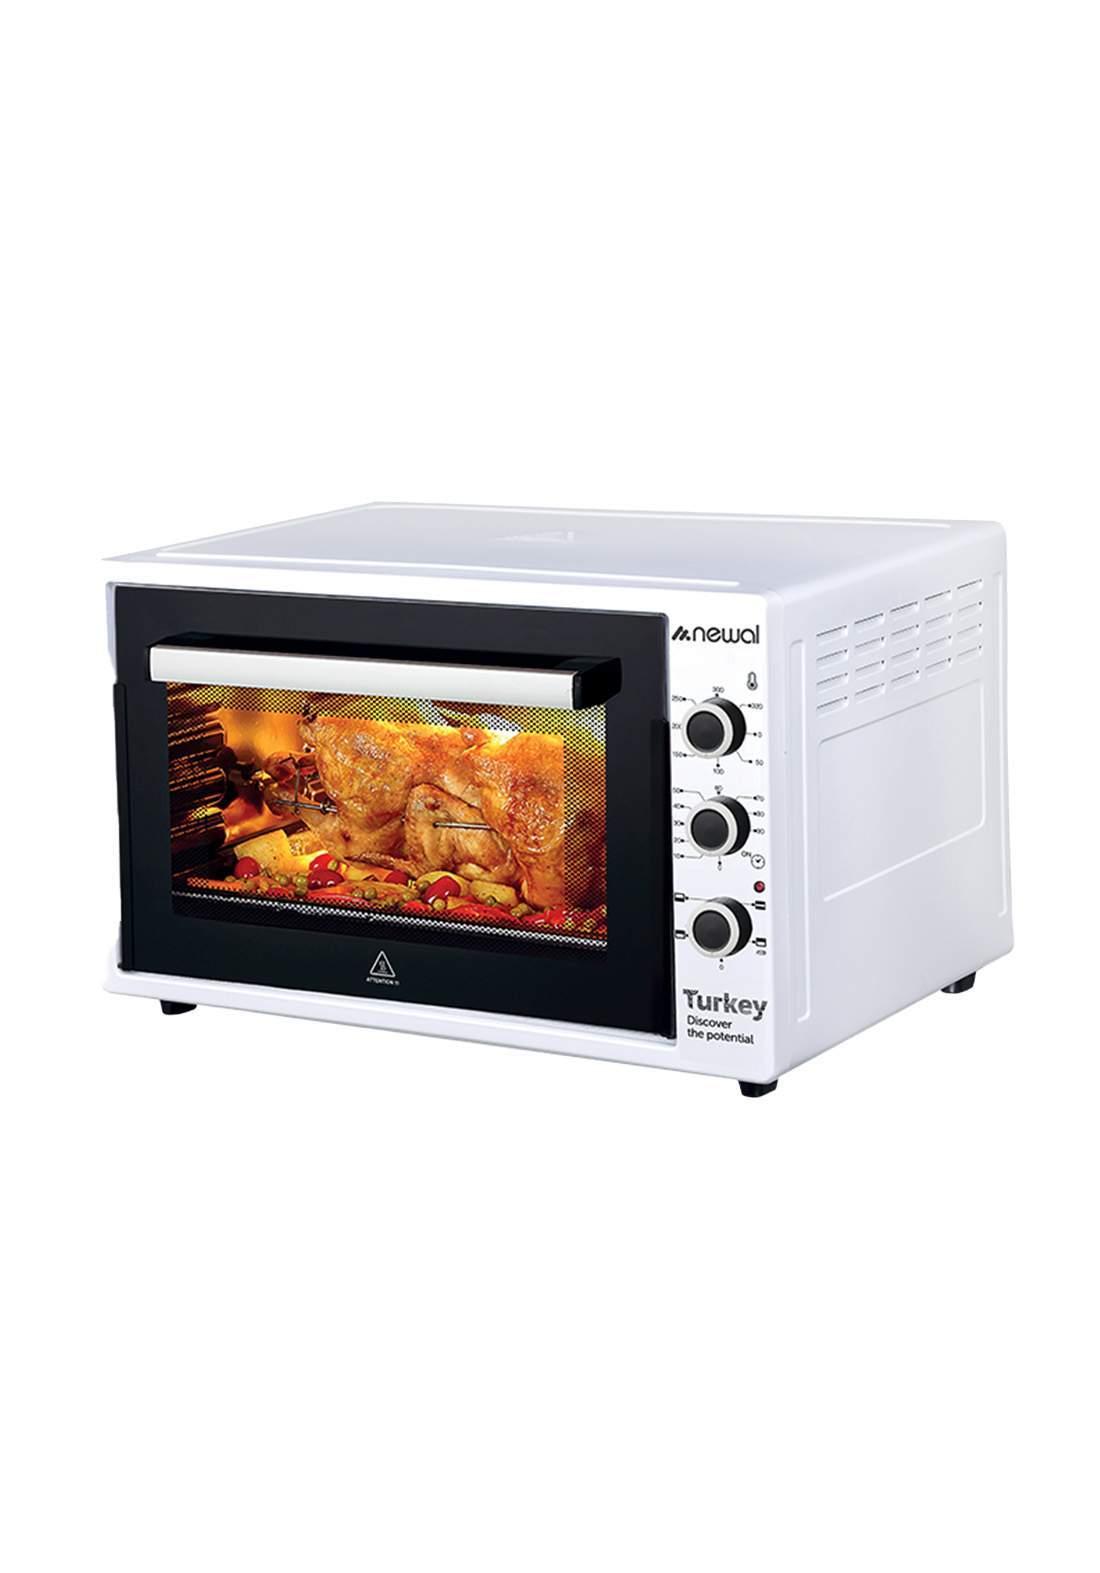 Newal Mini Oven 60L MOV-675-01 - White فرن كهربائي